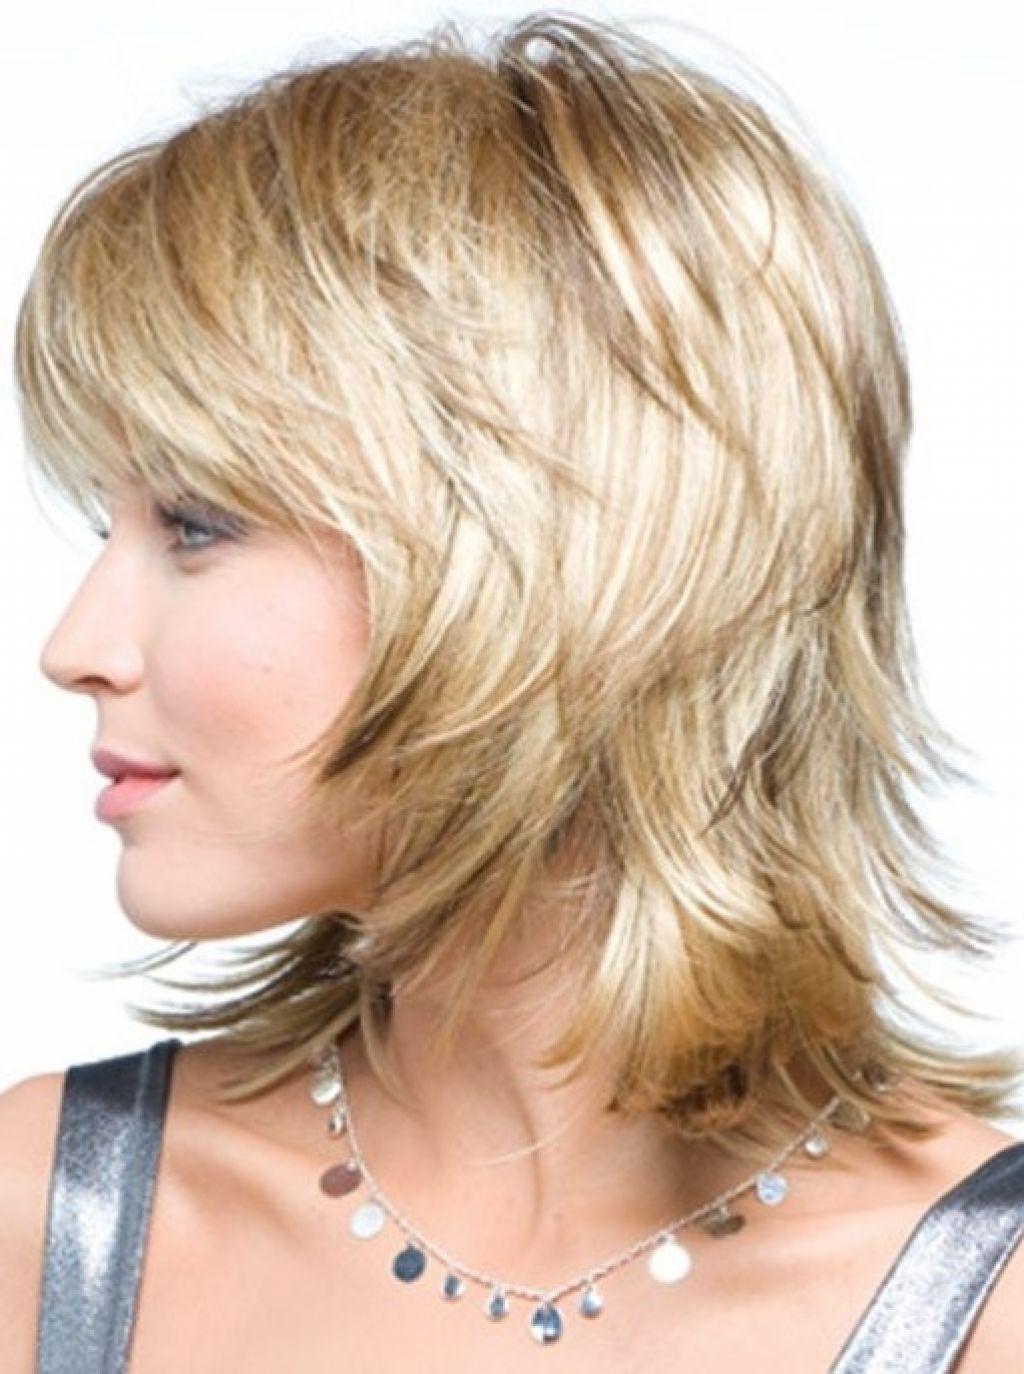 Layered Haircuts For Thin Hair - Hairstyle Ideas